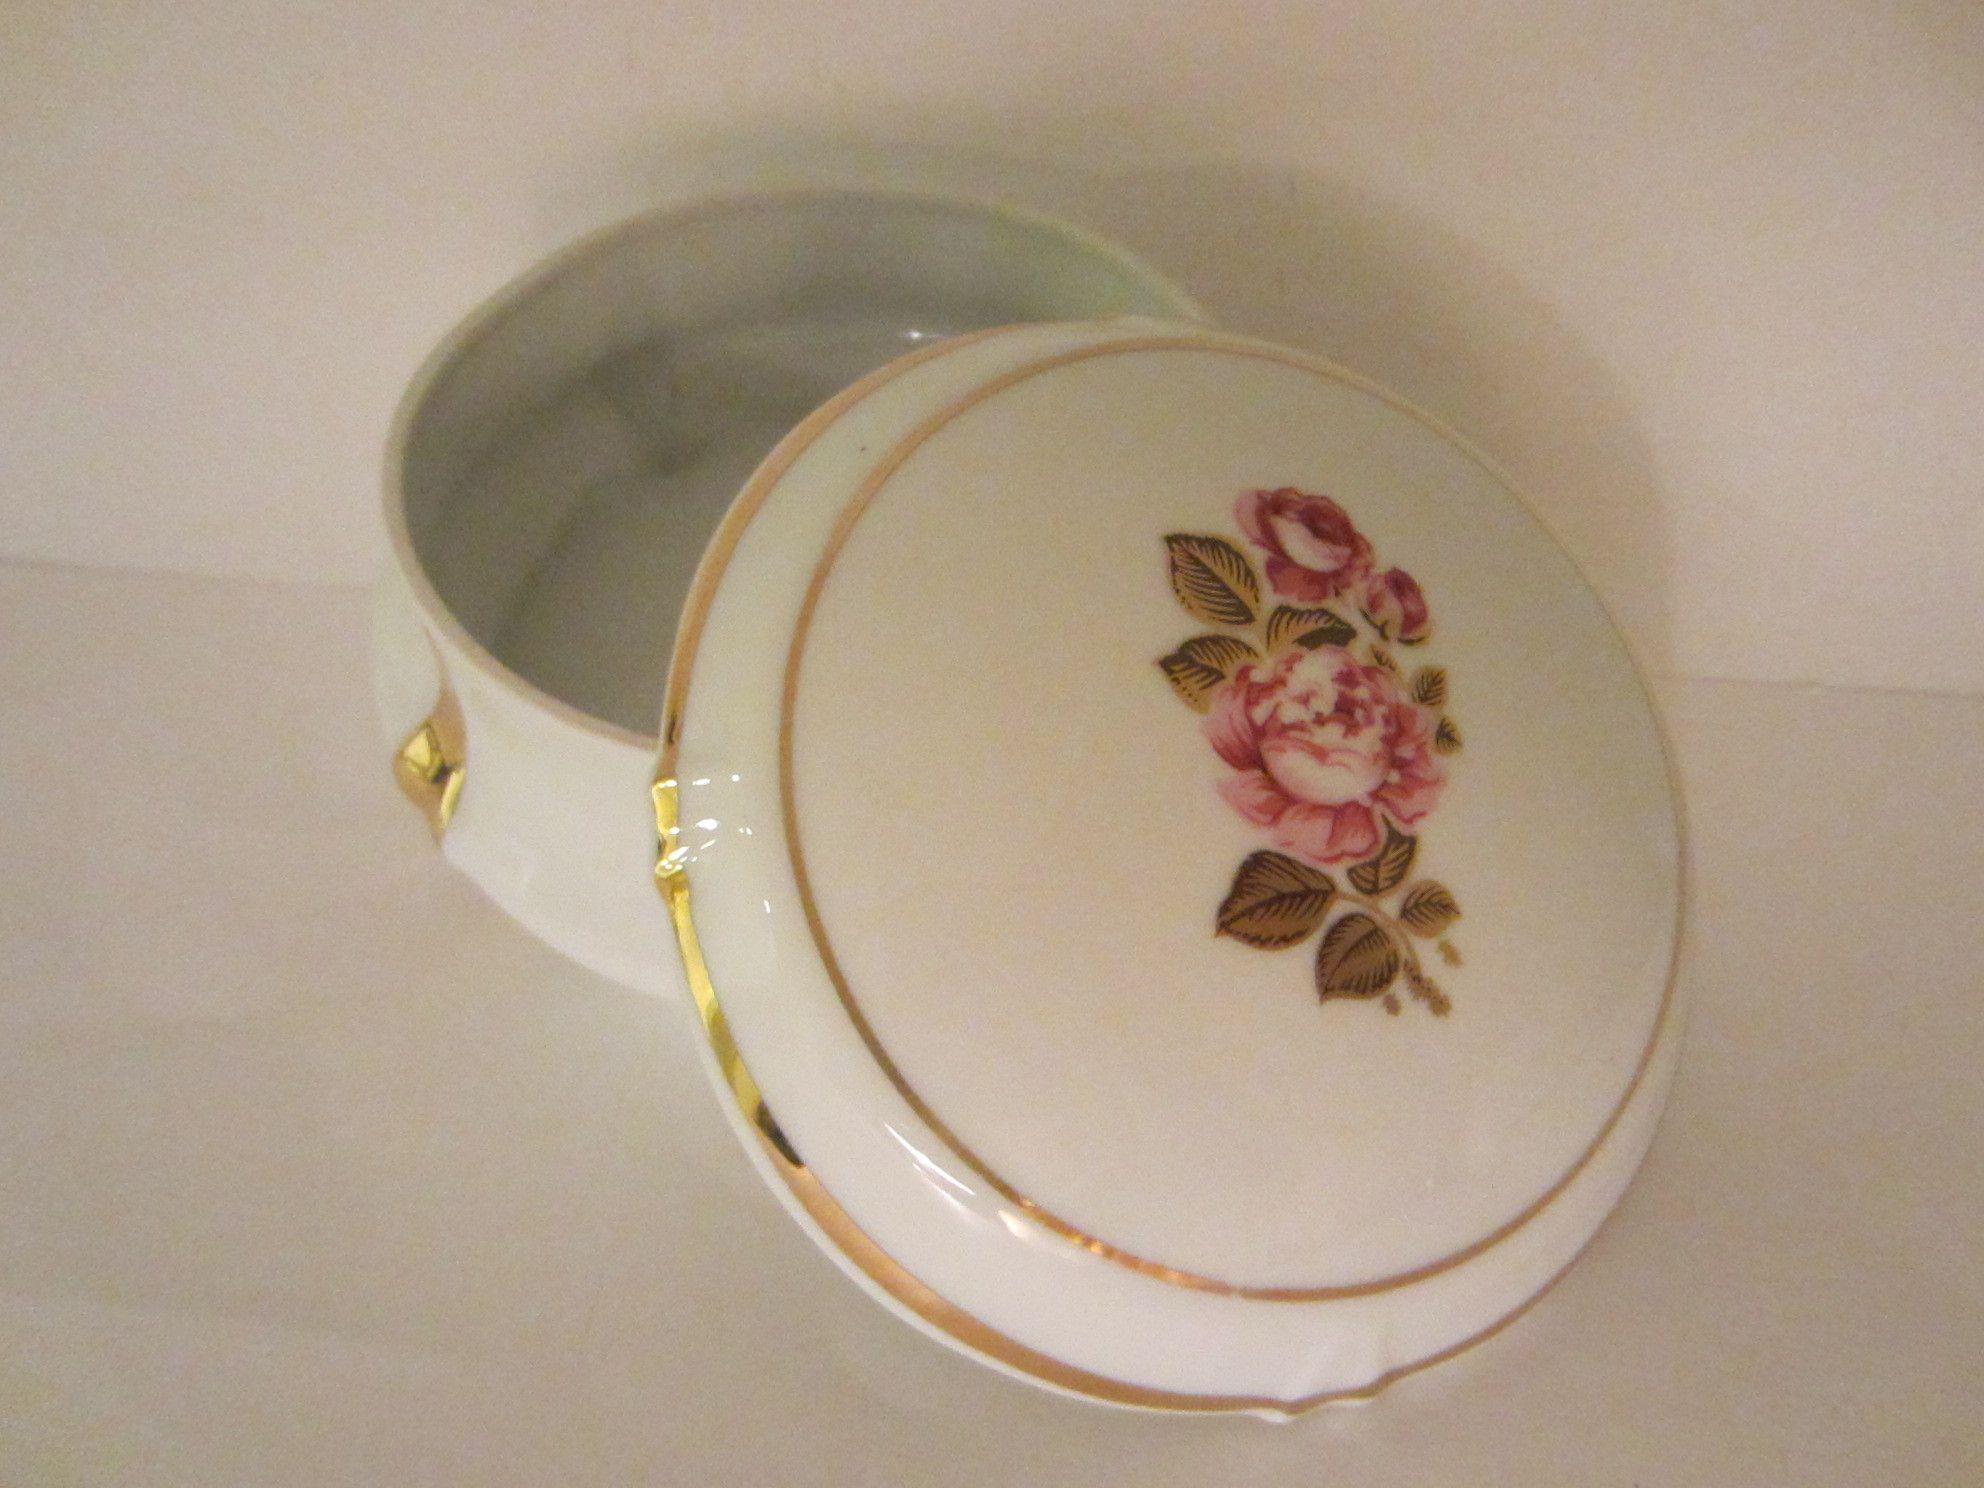 Limoges France Rose Medallion Porcelain Box With Stamp Mark Box Roses Limoges Gilt